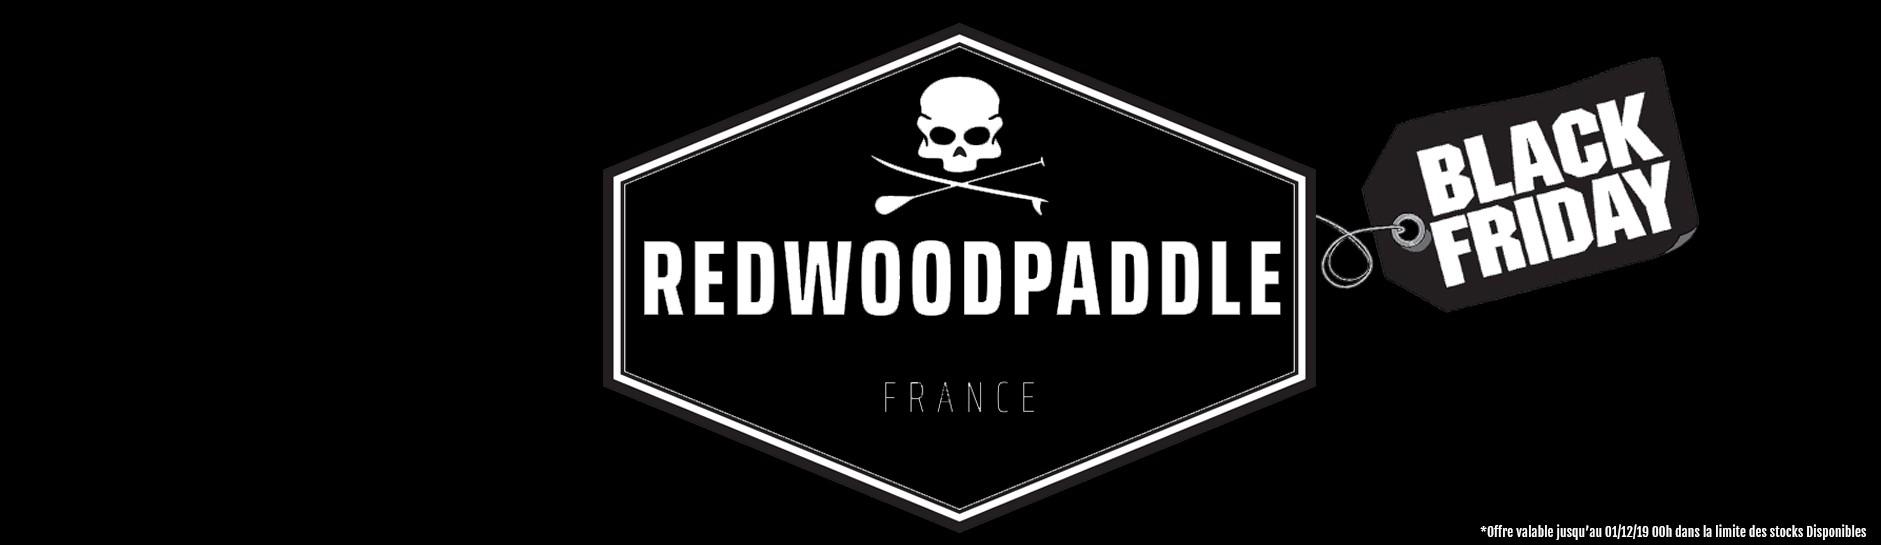 https://redwoodpaddle.com/fr/49-black-friday